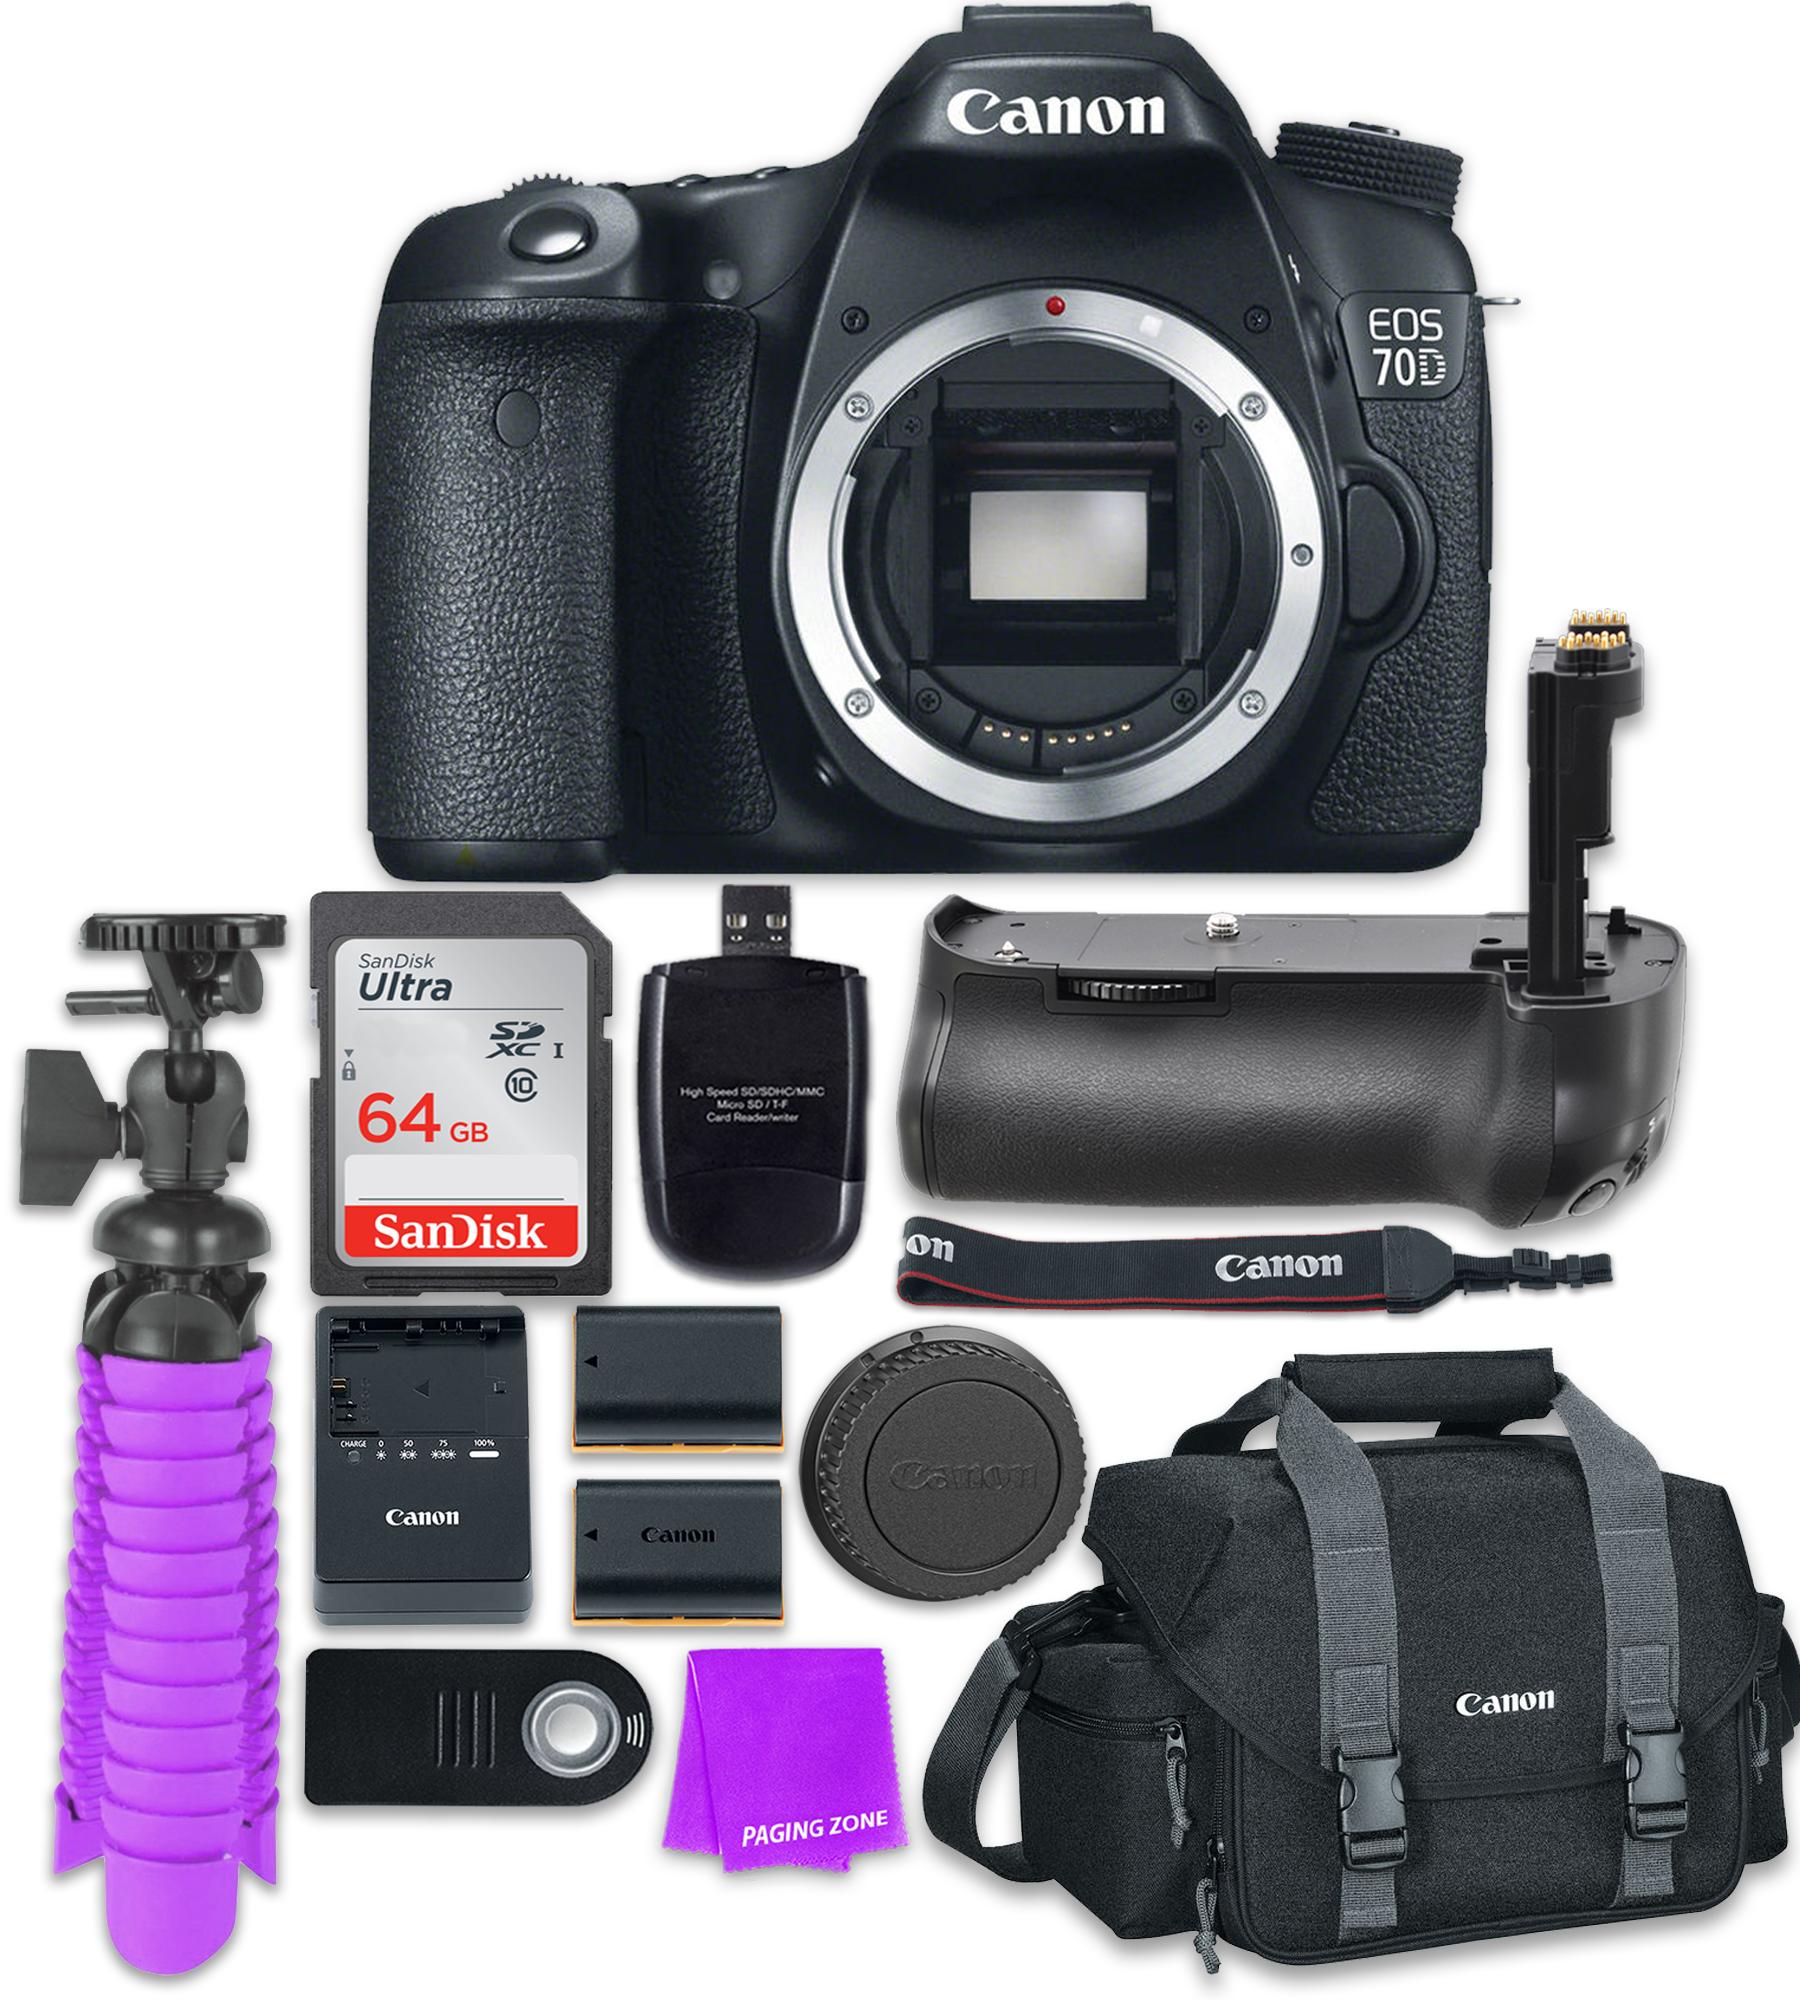 Canon EOS 70D SLR CMOS 20.2MP Wi-Fi Enabled Digital SLR Camera with (Body) + Accessory Bundle